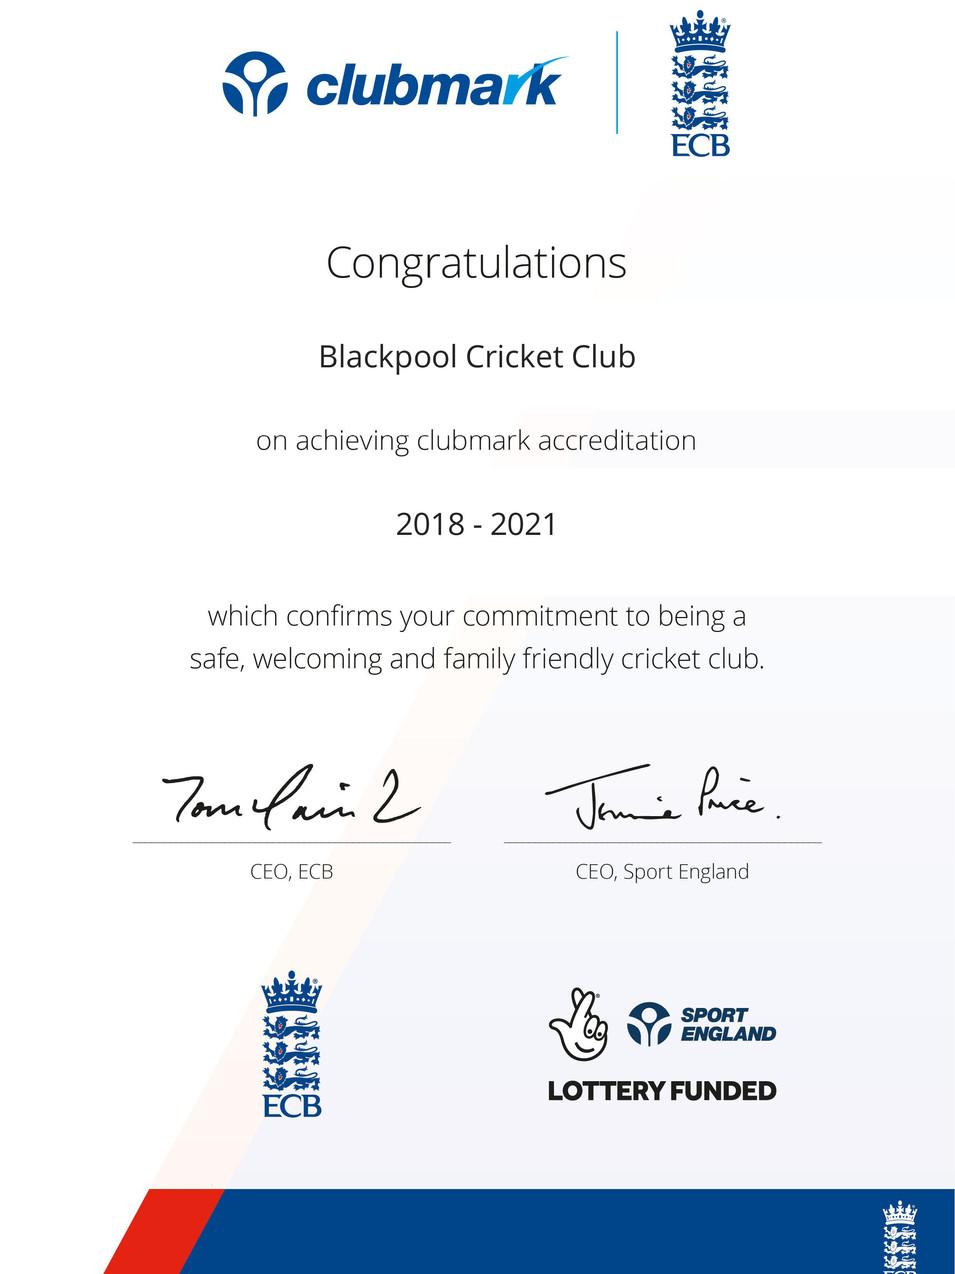 Blackpool Cricket Club Clubmark